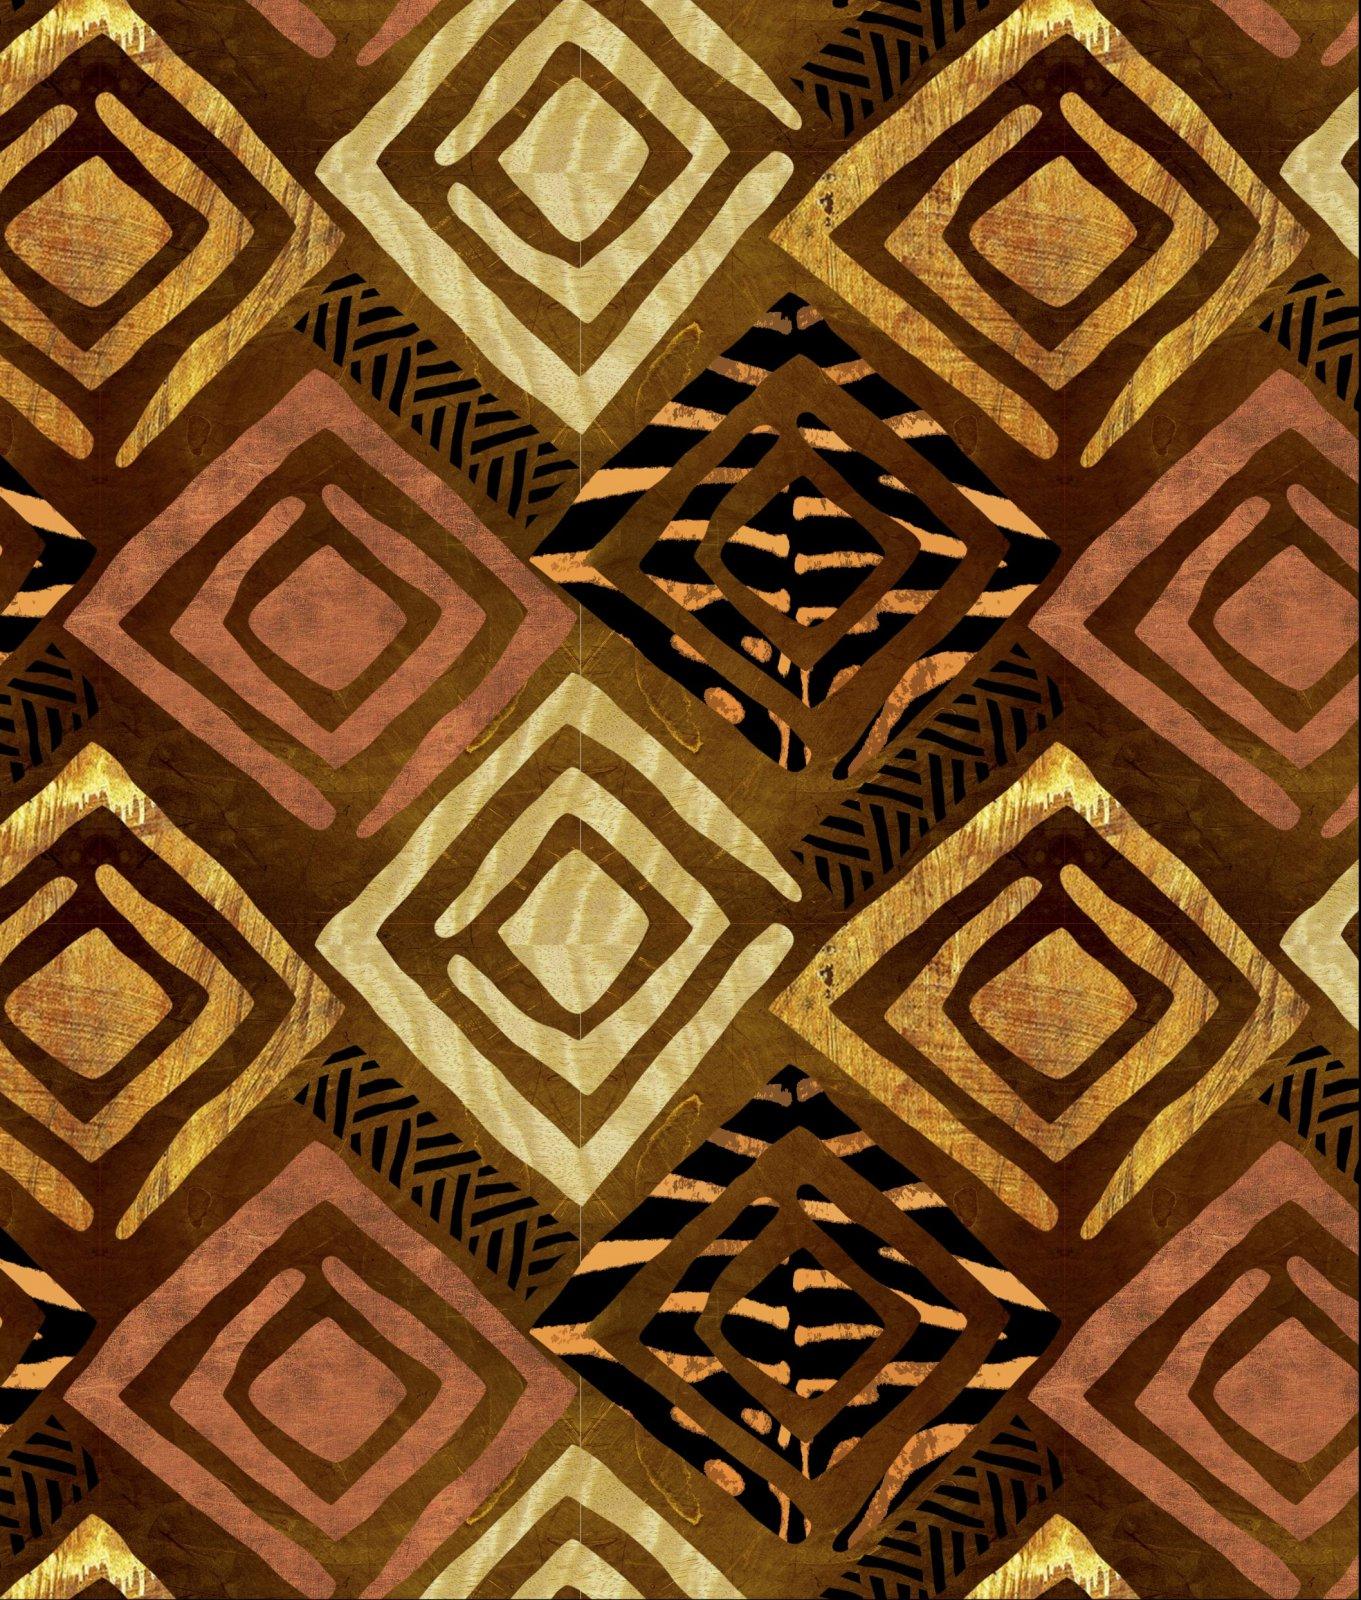 DT-Exclusive Digital Prints DT-5289-0C-1 Gold/Black - South African Arts